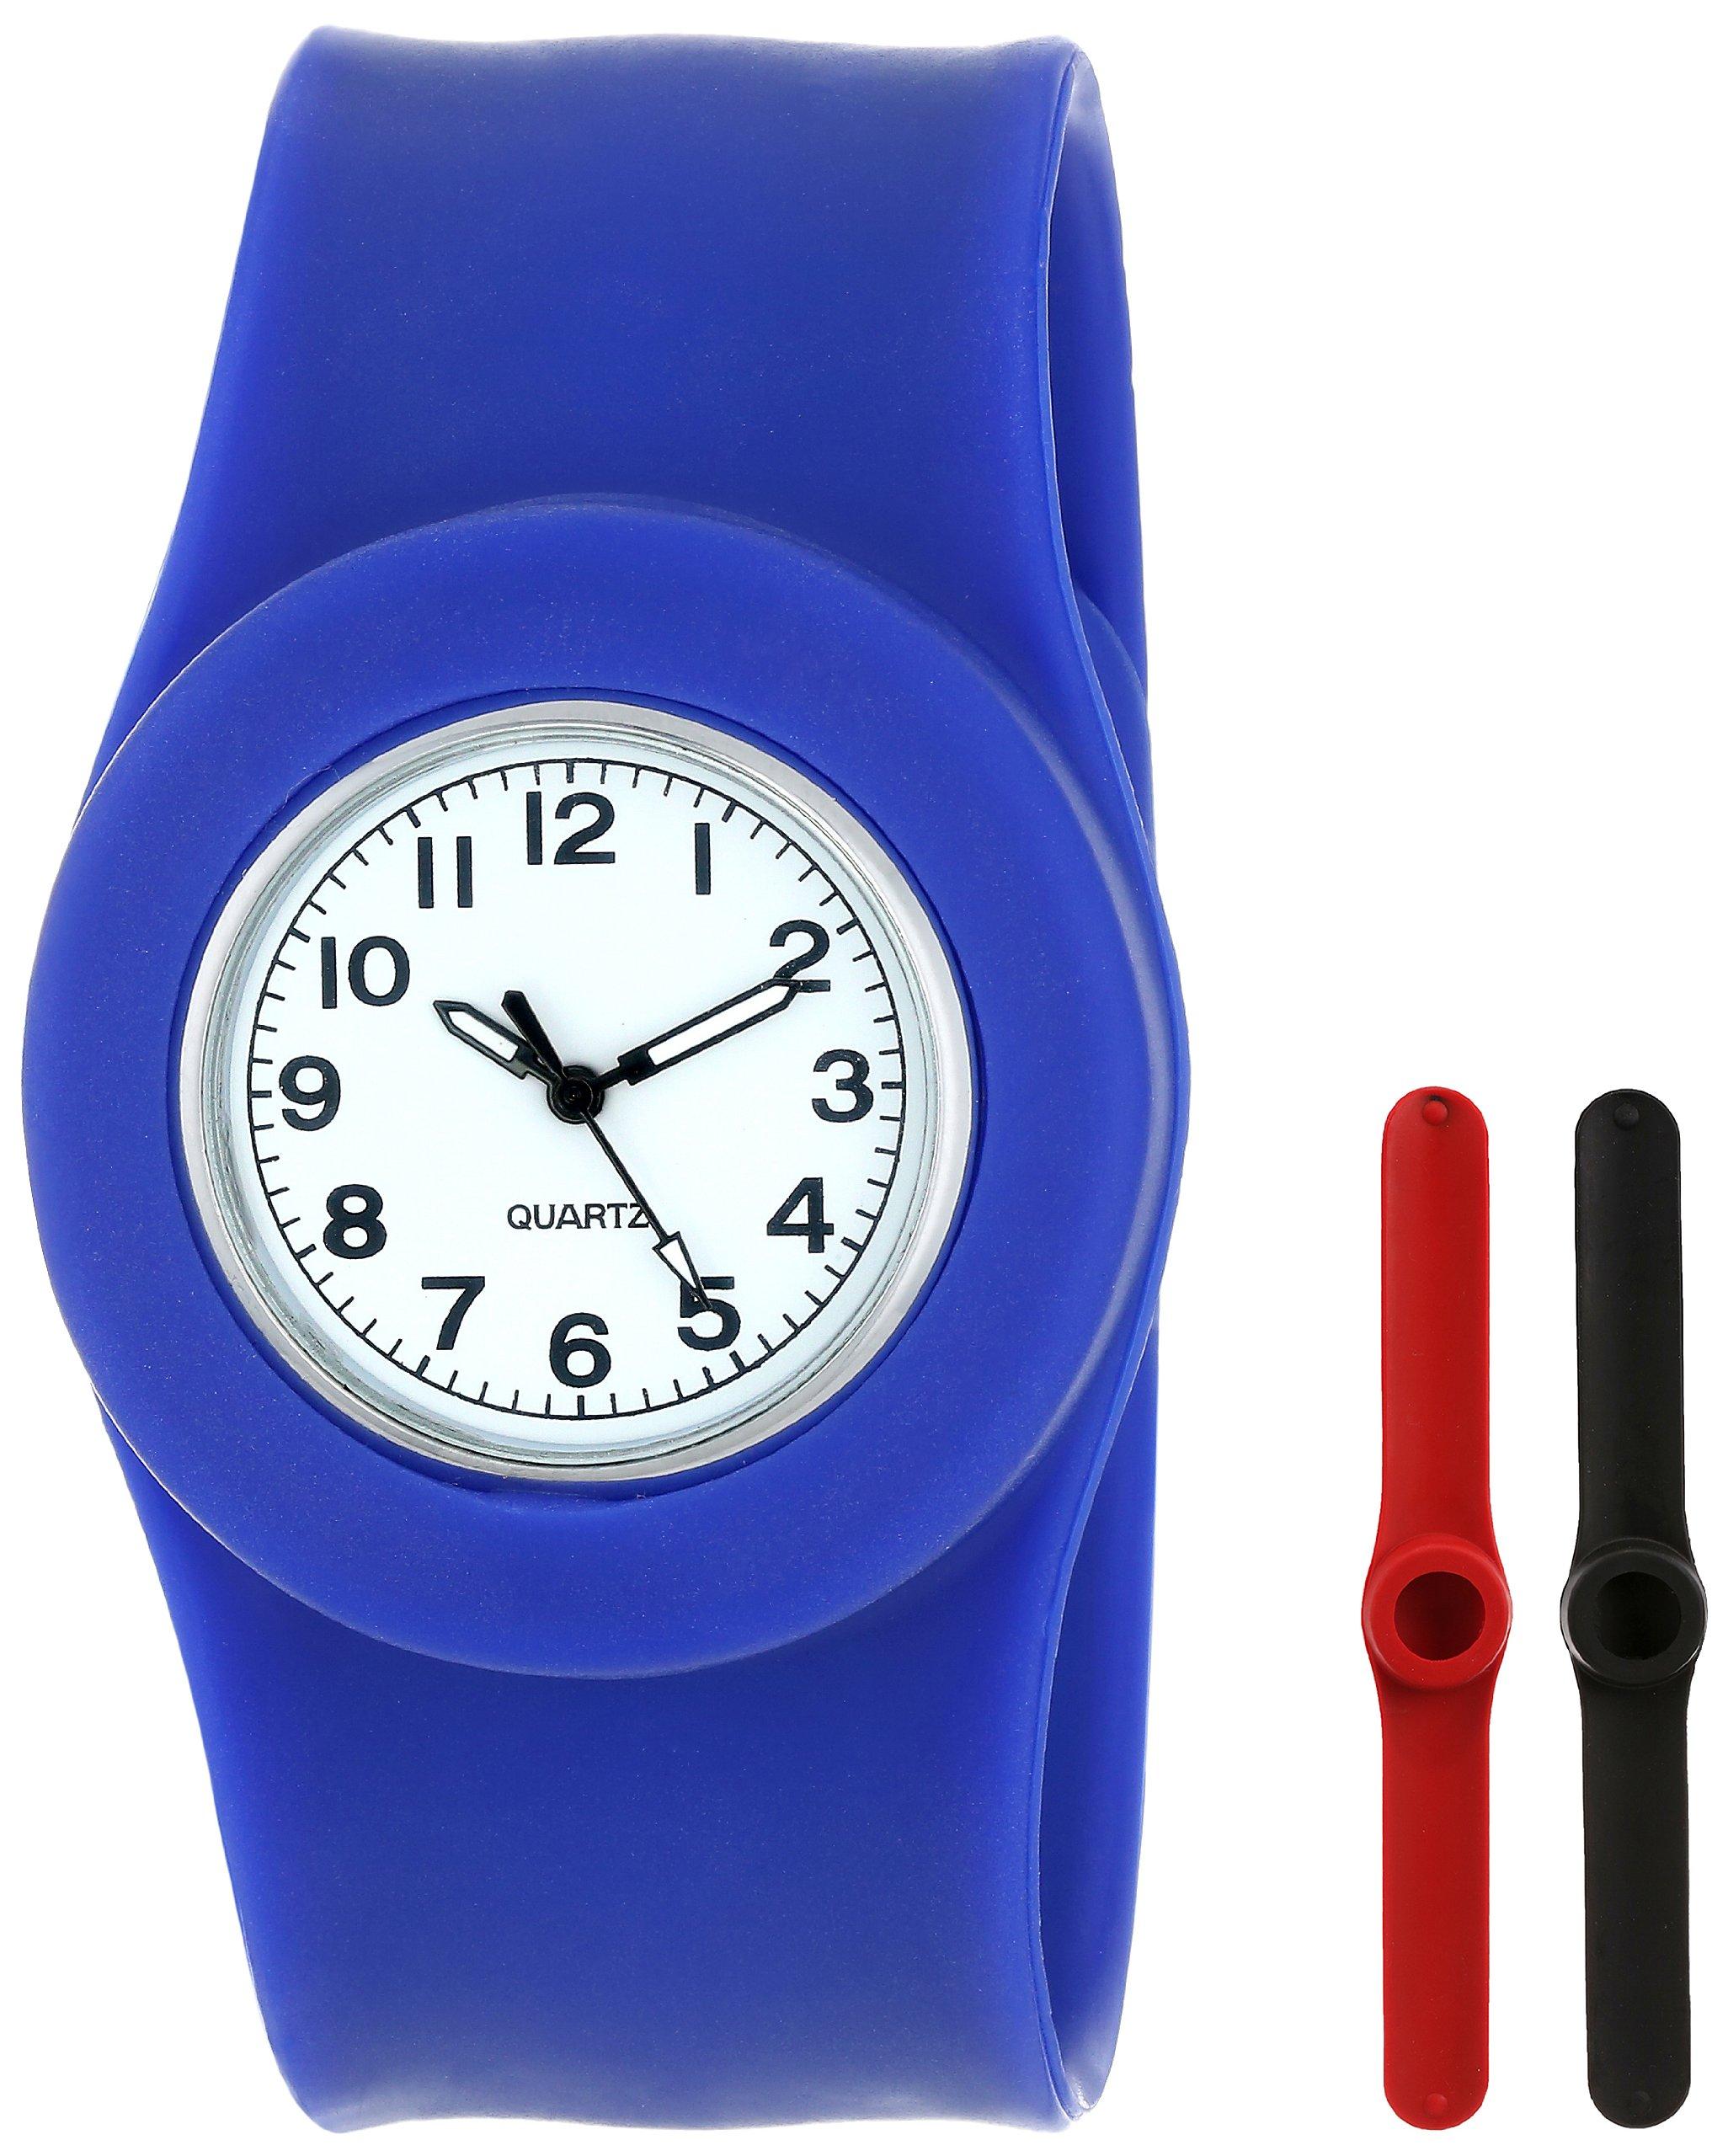 Slide Kids' SL3P-JUURL Slap 3PAQ Jumbo Blue, Red and Black Watch